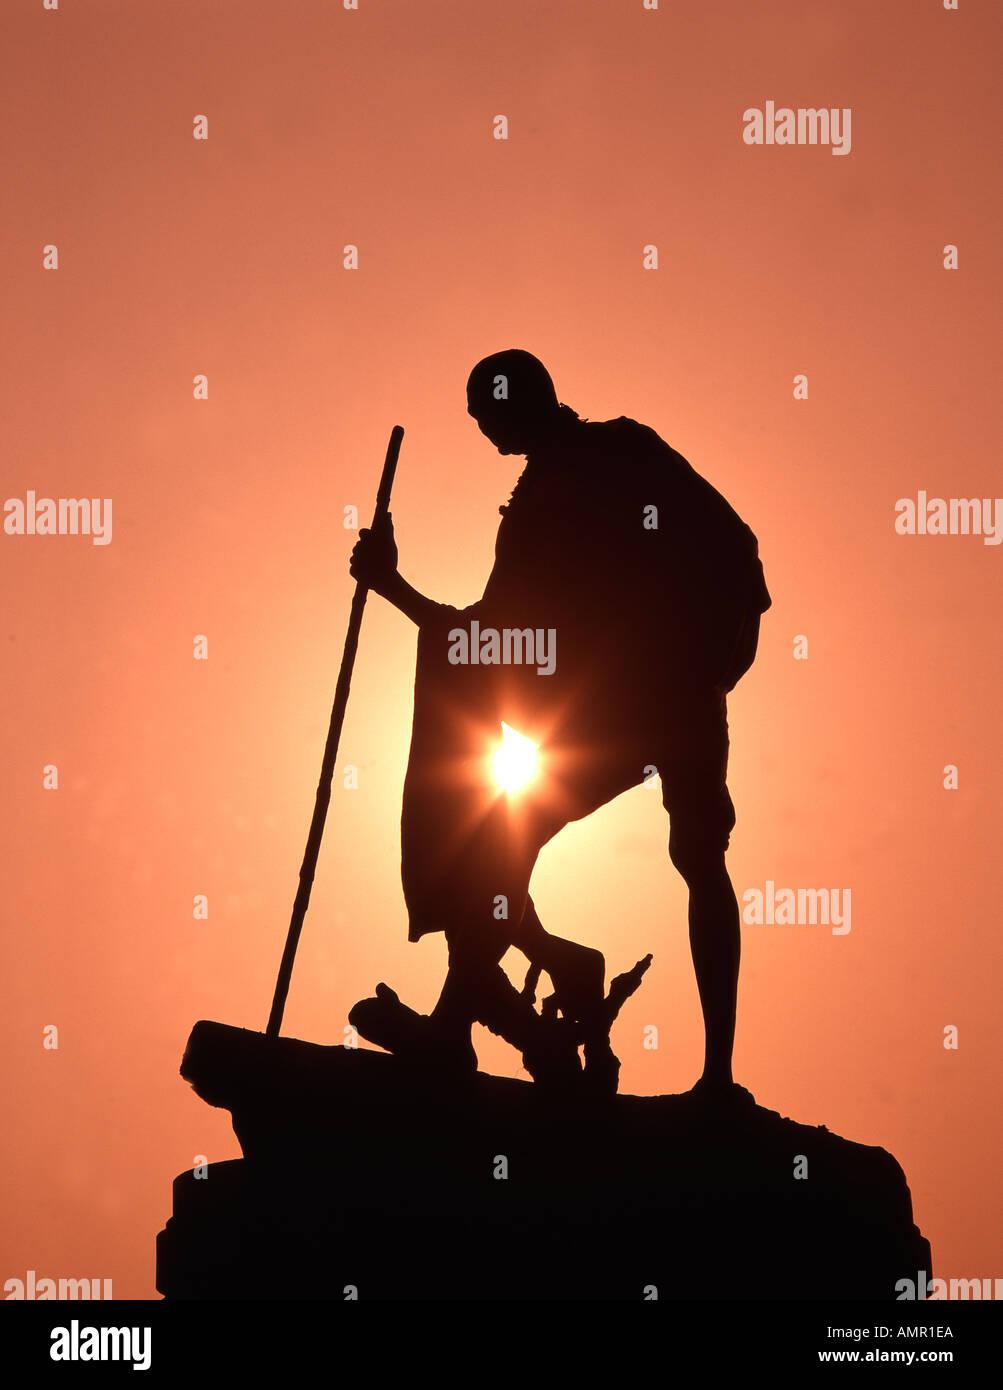 India Tamil Nadu Chennai Mahatma Gandhi - Stock Image